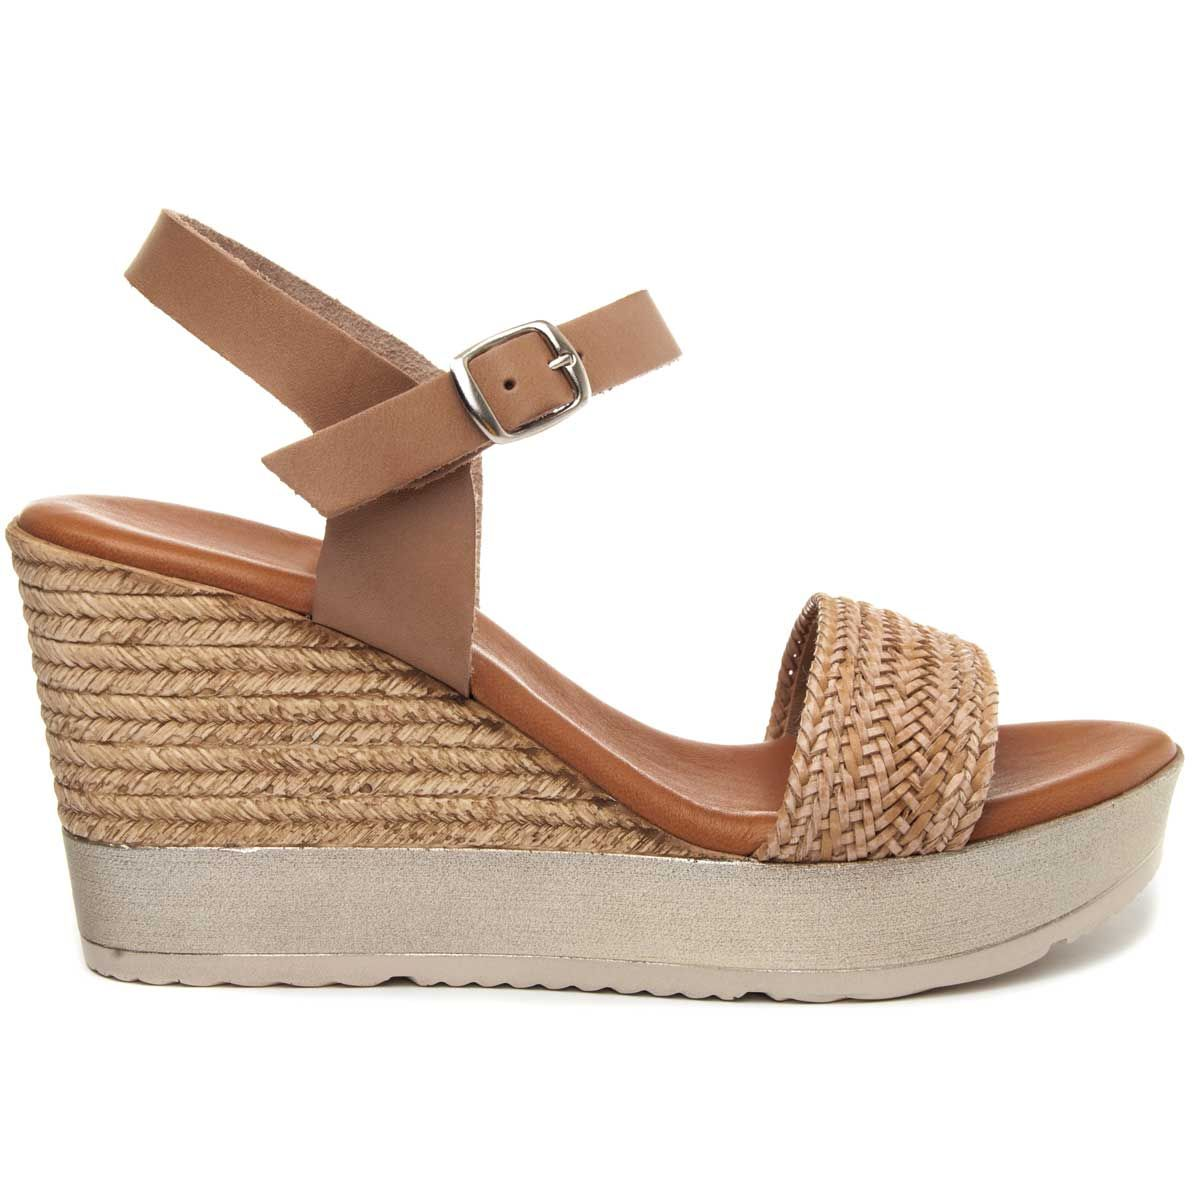 Purapiel Wedge Sandal in Beige